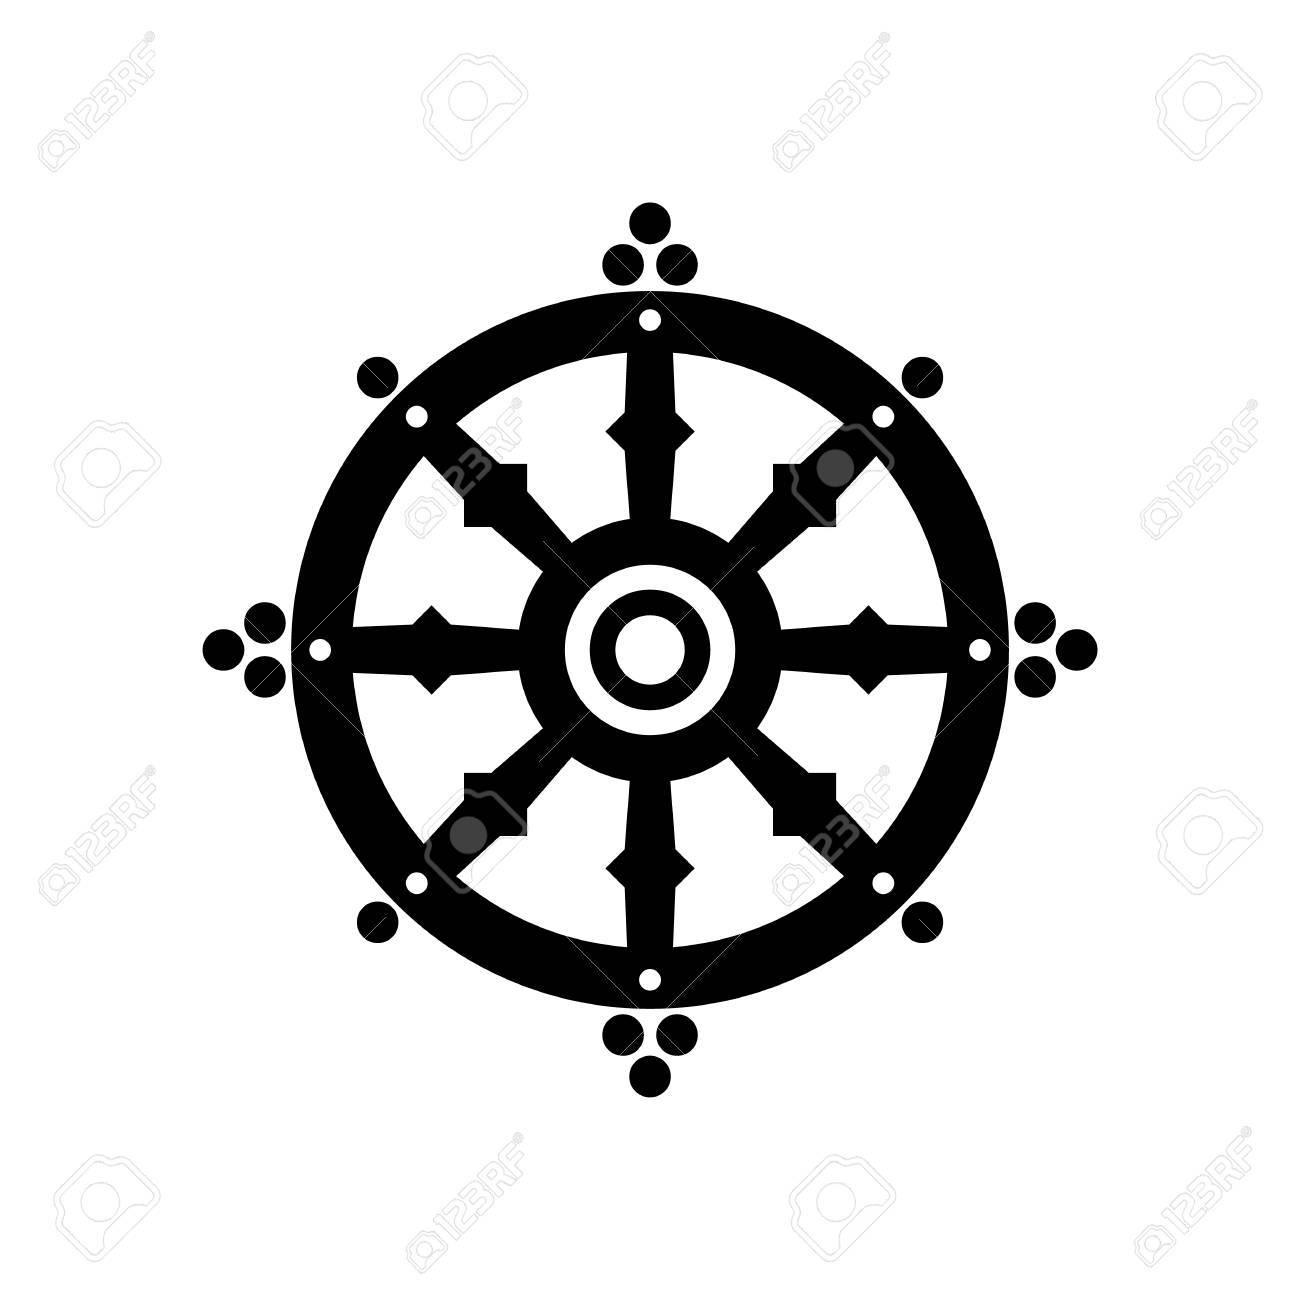 Dharma wheel of fortune spirituality buddhism religious symbol dharma wheel of fortune spirituality buddhism religious symbol raster illustration stock illustration buycottarizona Image collections